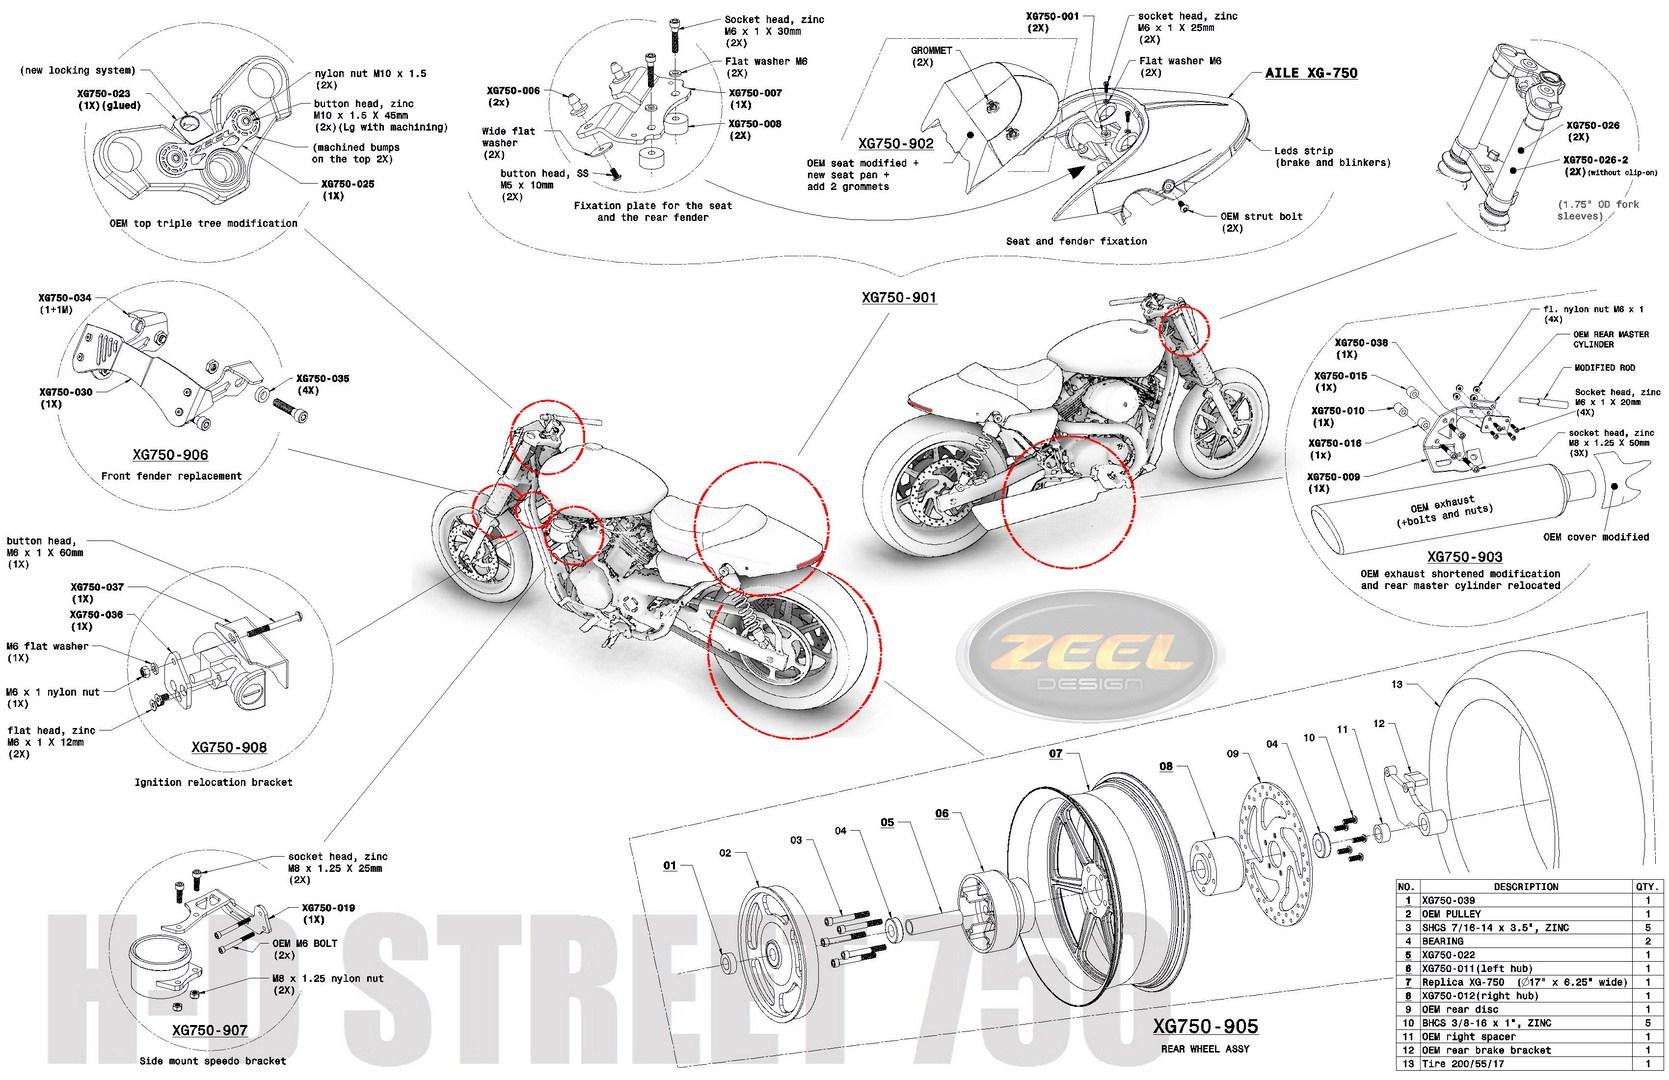 Street 750 parts list